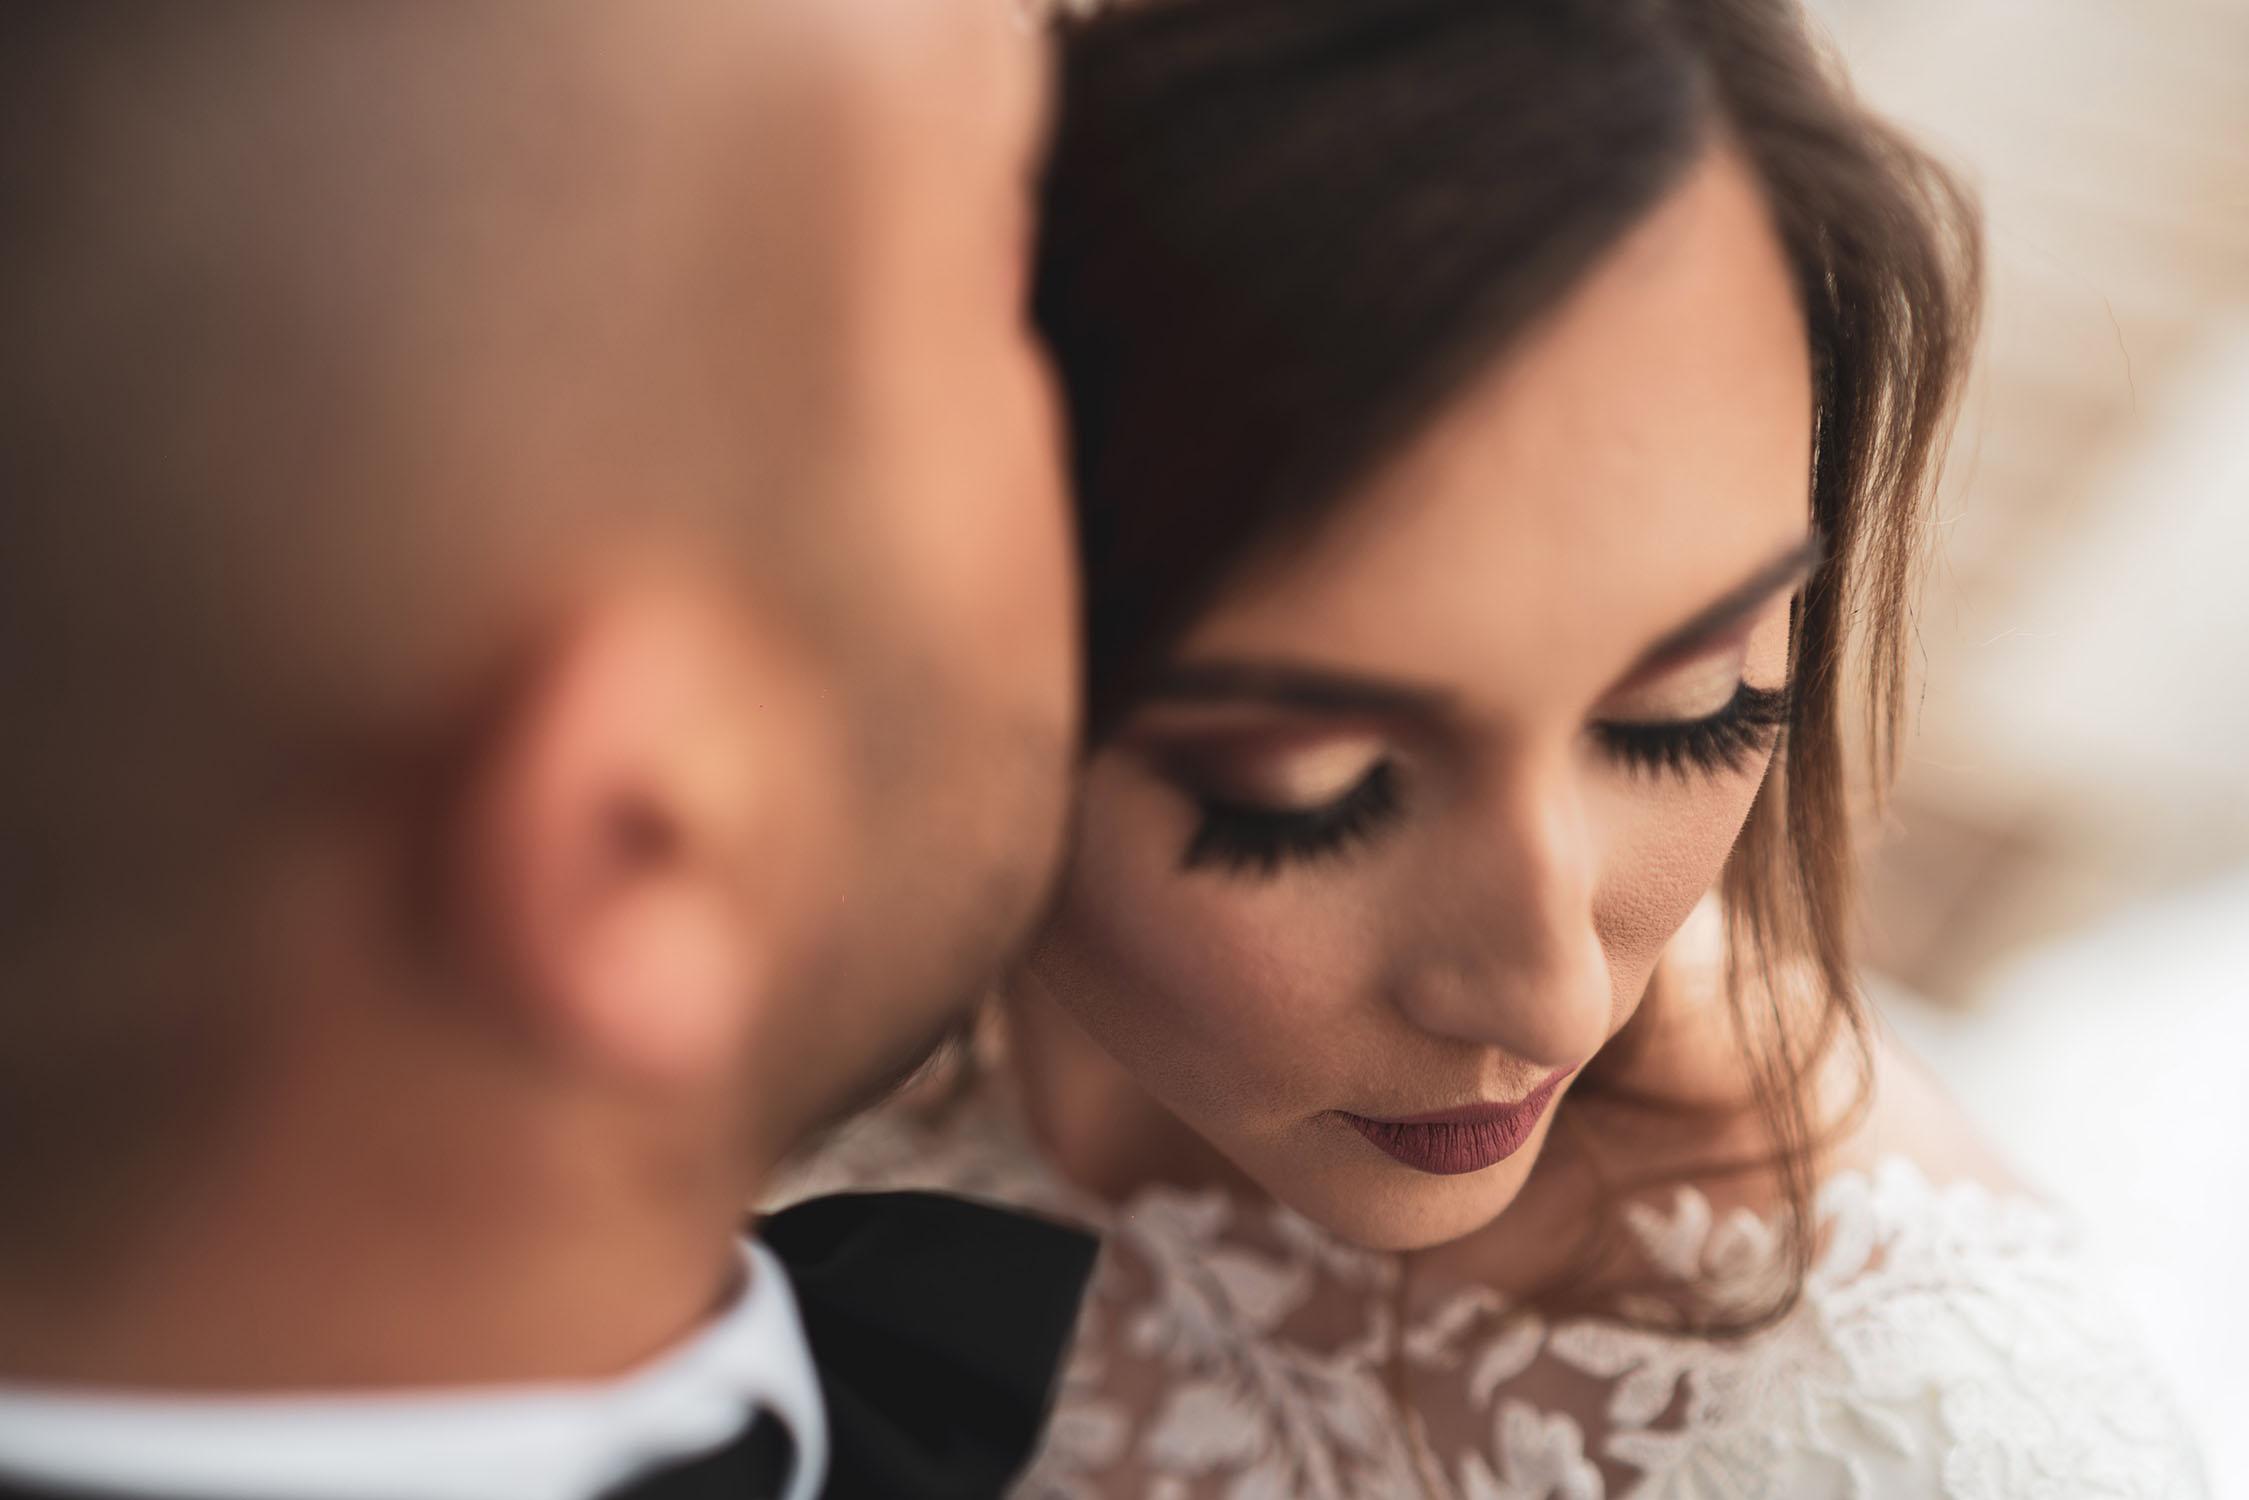 Braut mit geschlossenen Augen.jpg